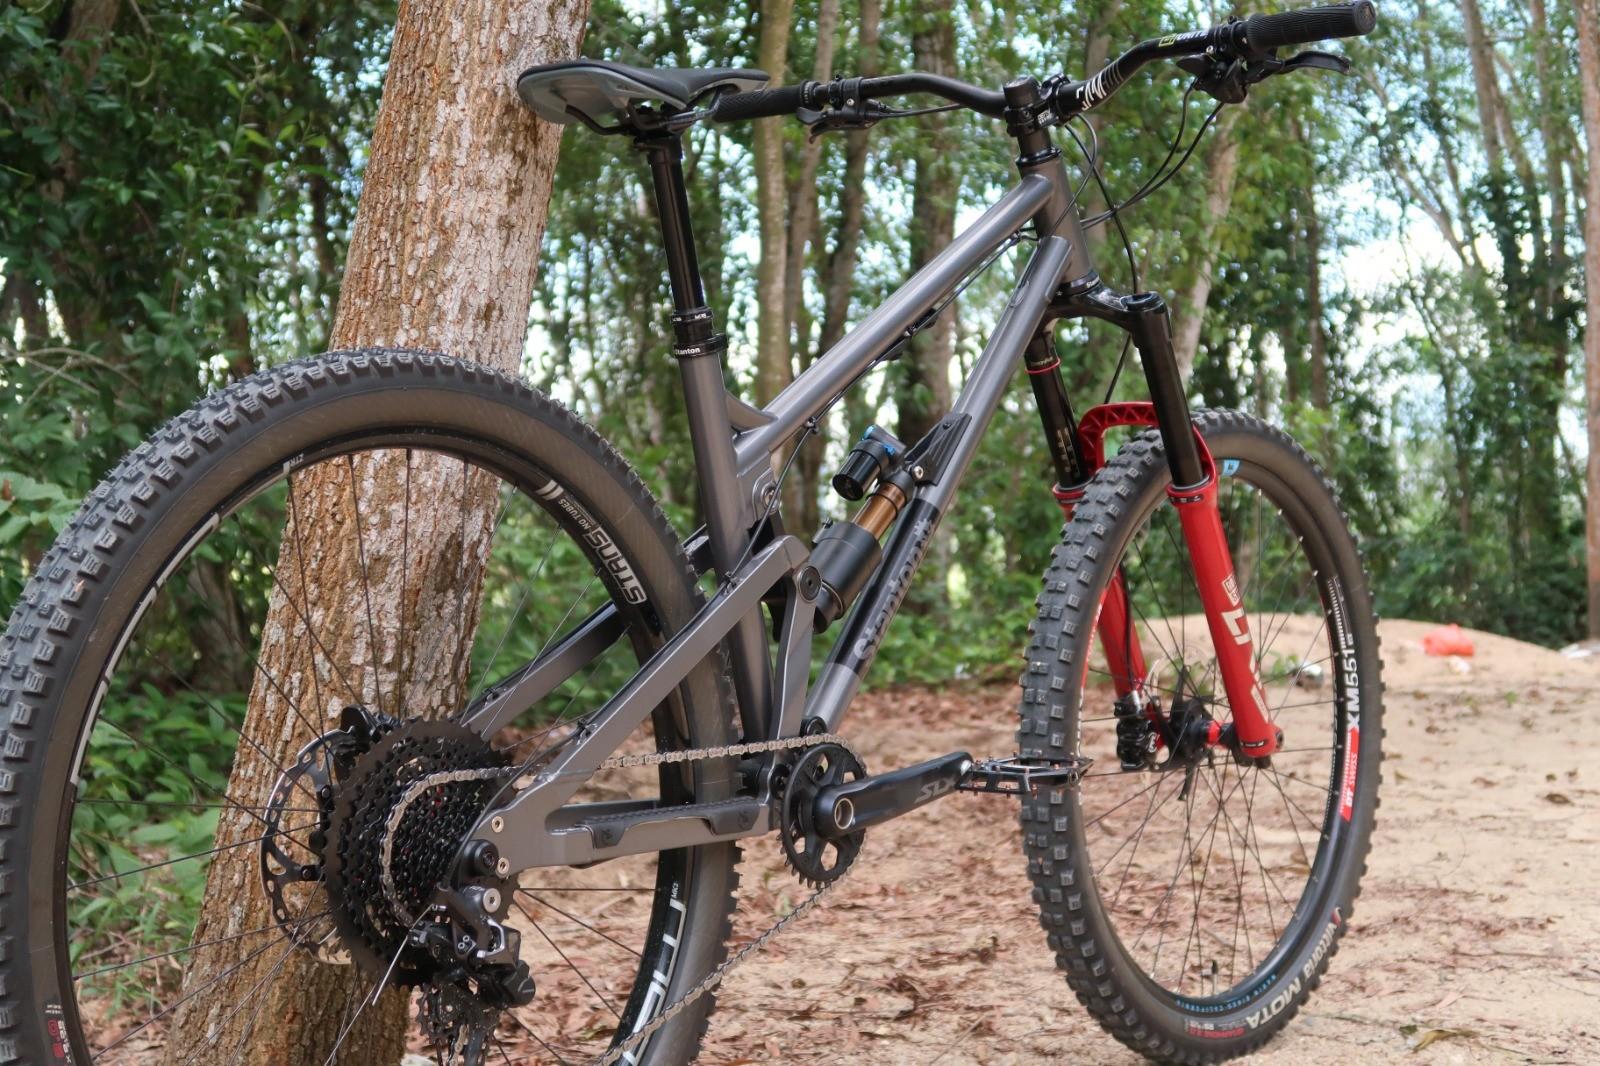 Stanton Switch9er FS - Jeremy_Koh - Mountain Biking Pictures - Vital MTB